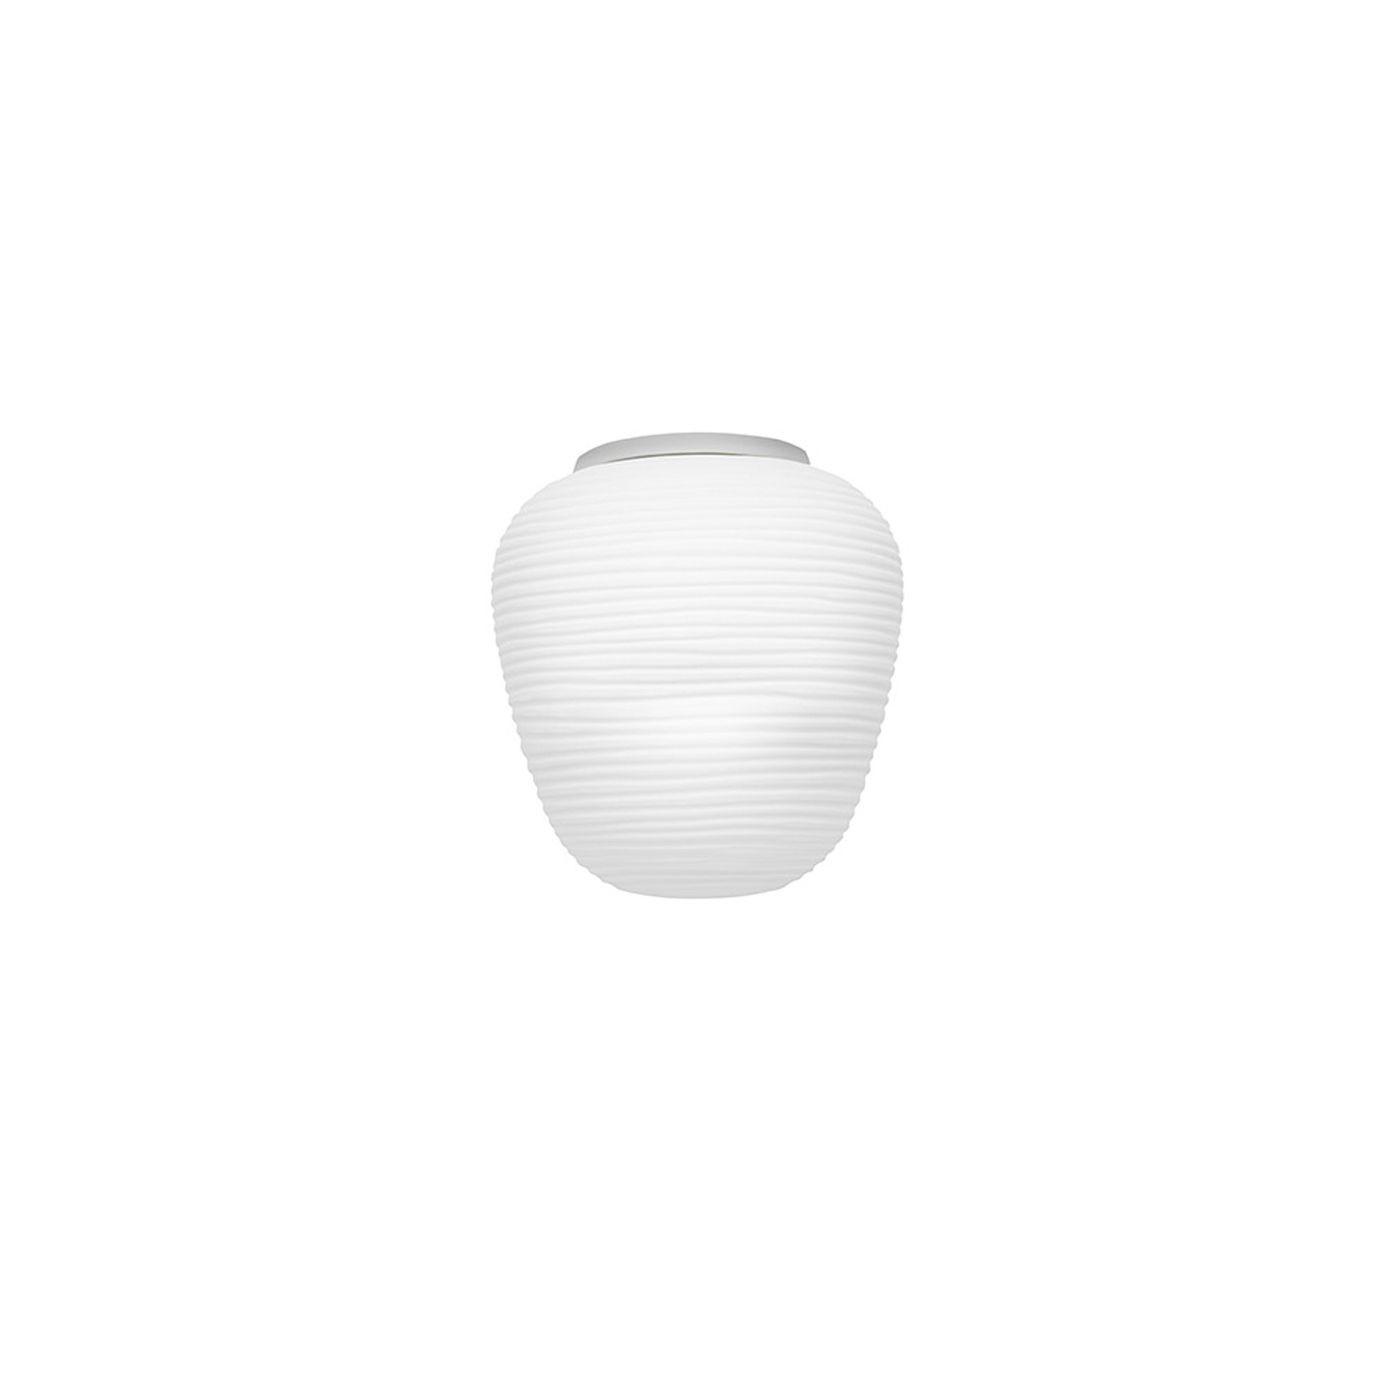 Rituals 3 Semi Væglampe Hvid - Foscarini